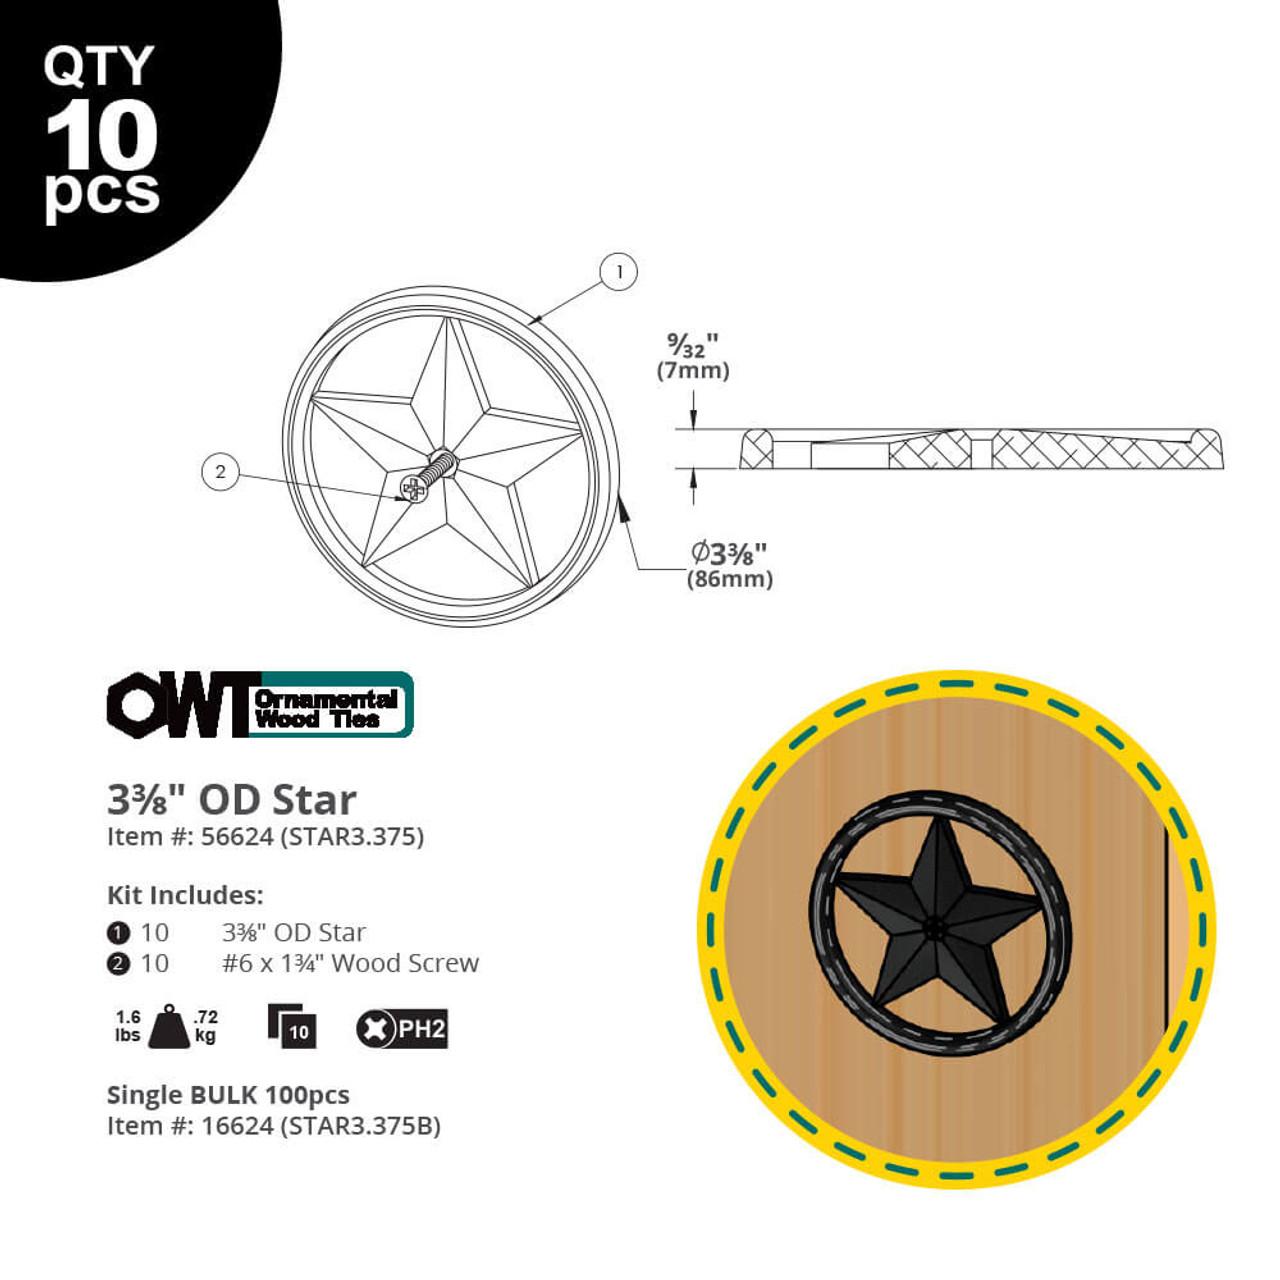 "3-3/8"" OZCO OWT Hardware Decorative Metal Star - Dimension Drawing"